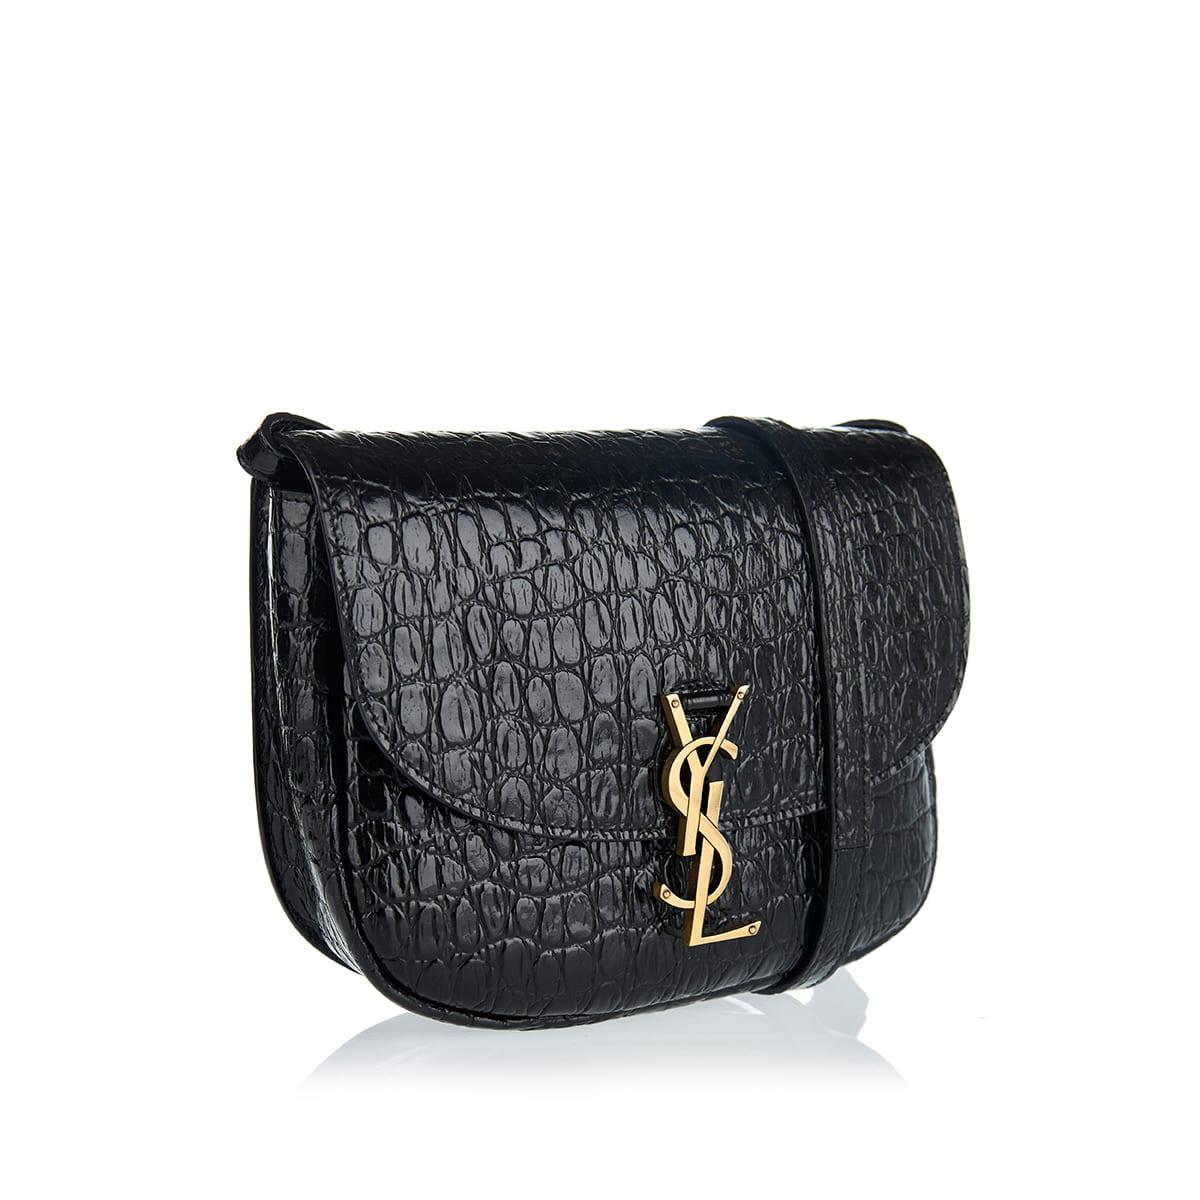 Kaia croc-effect leather bag